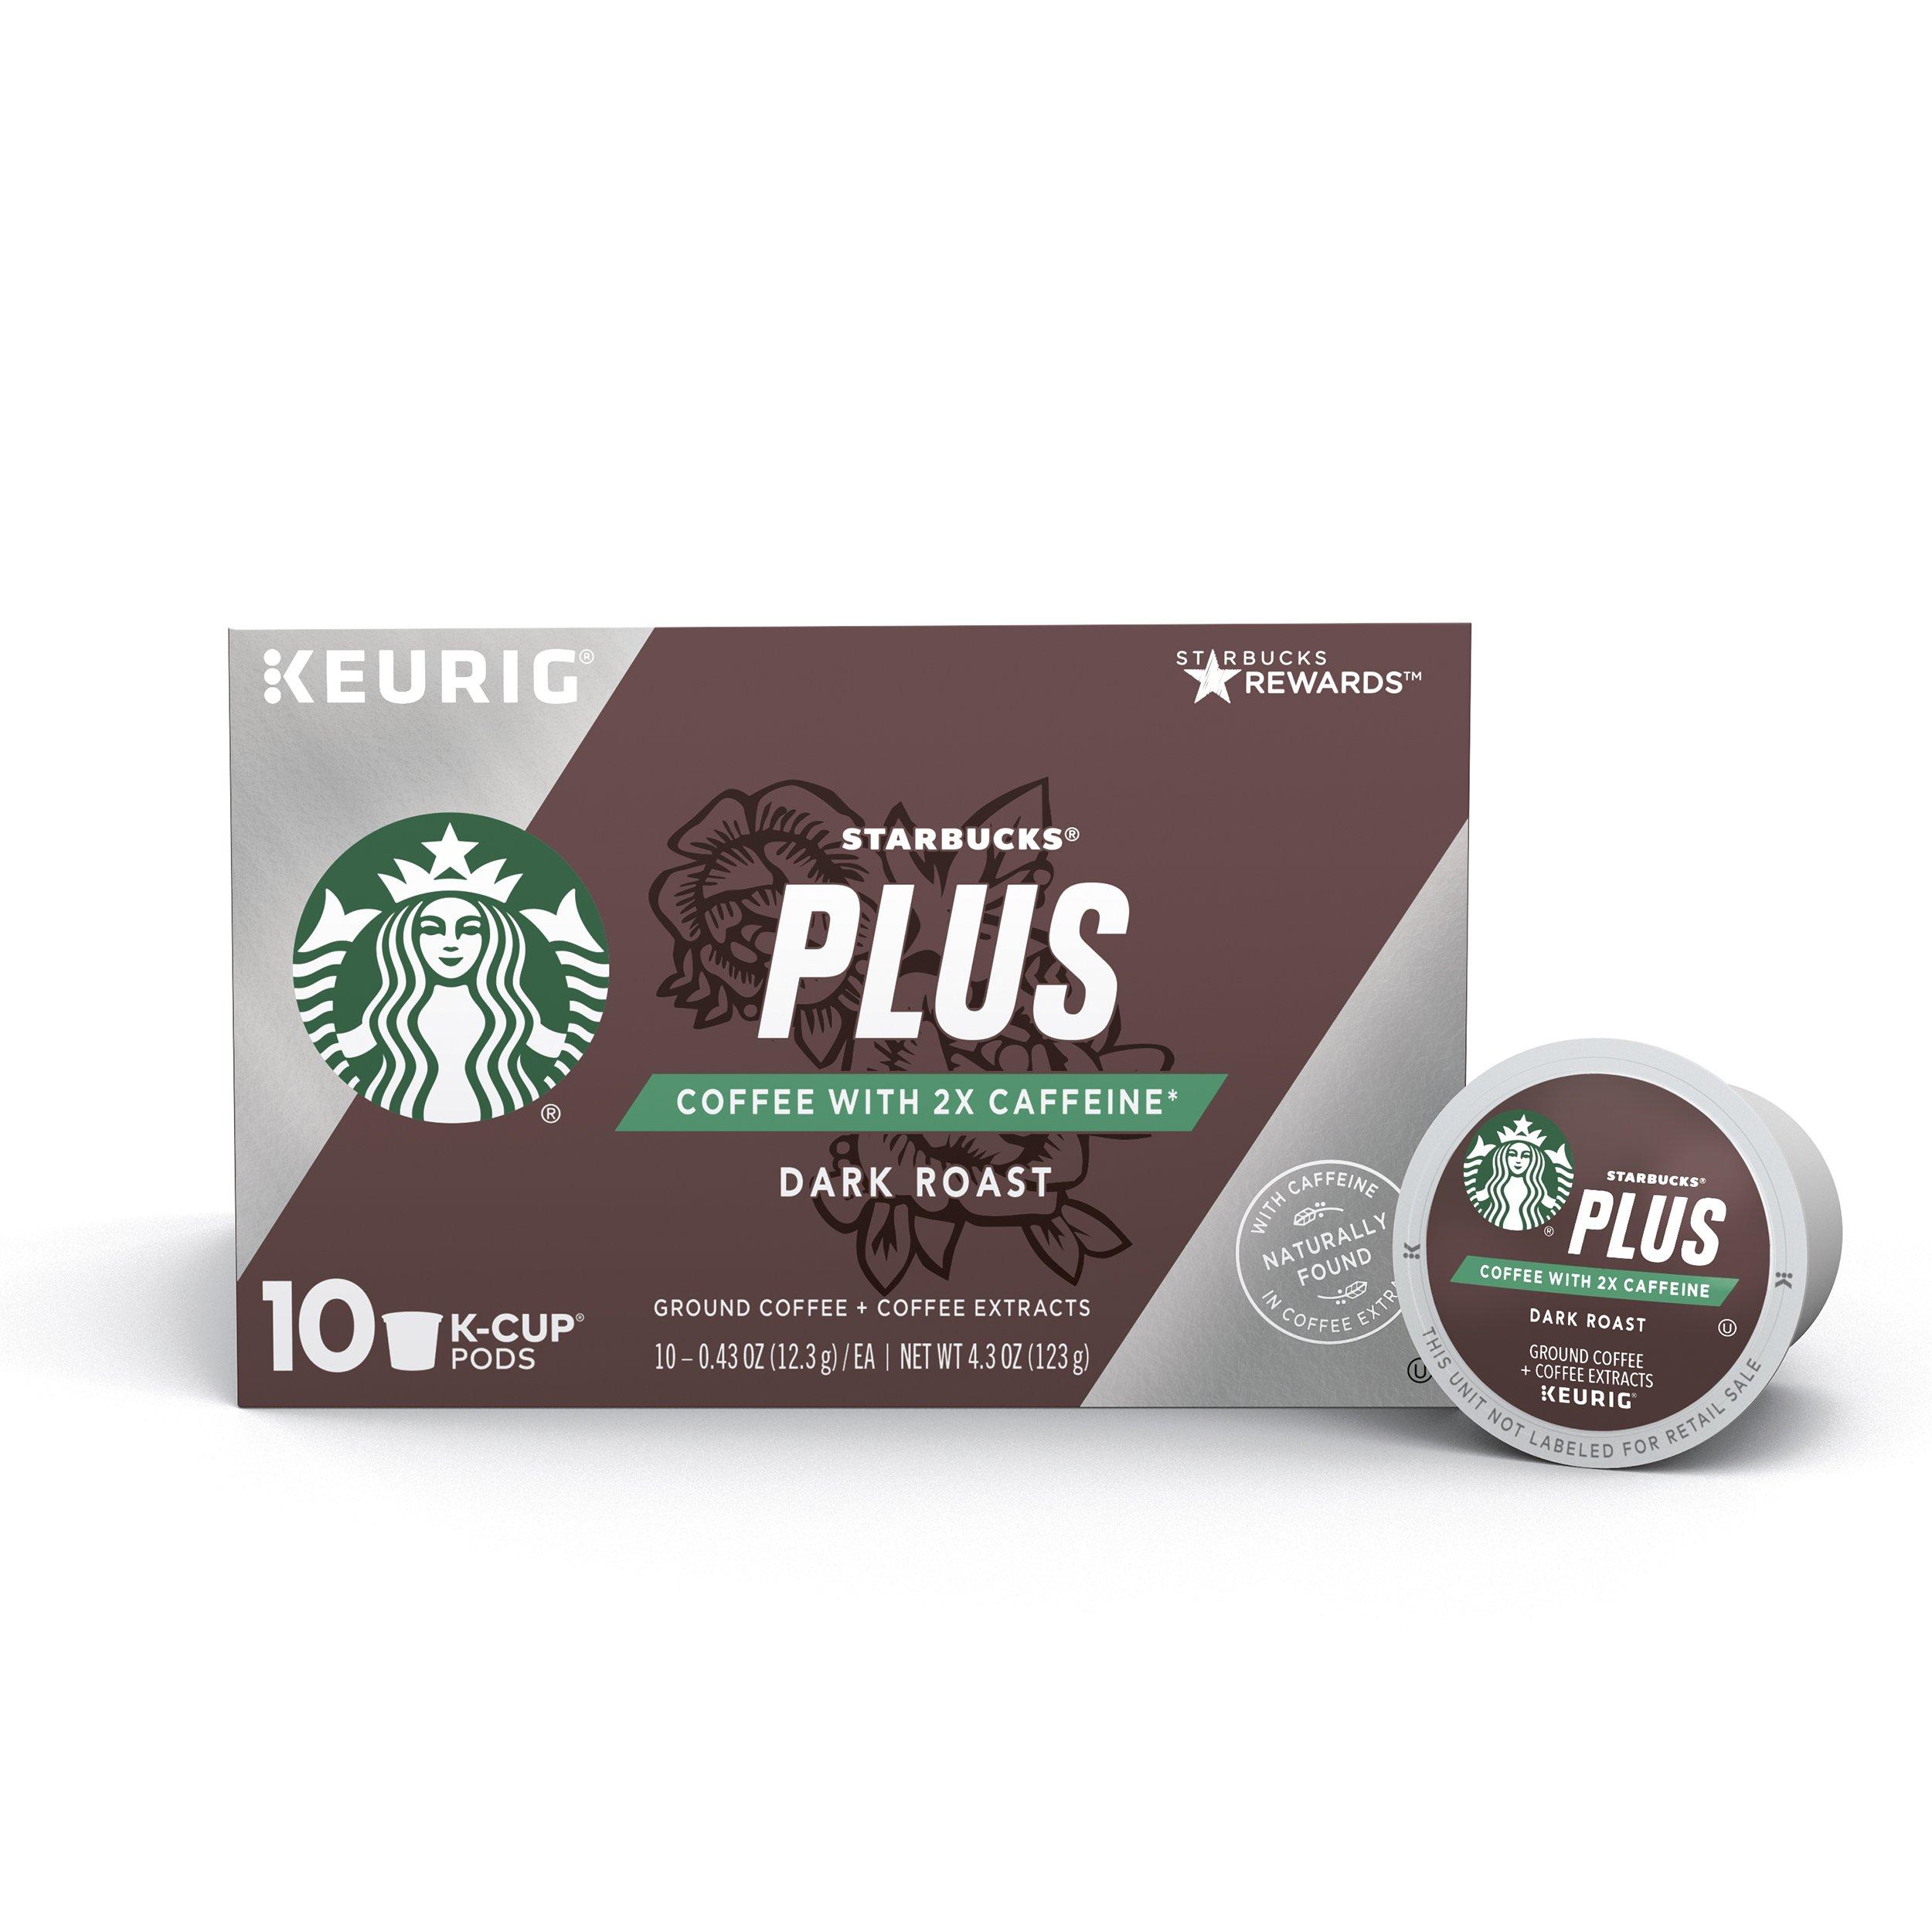 Starbucks Plus Coffee 2X Caffeine Dark Roast Single Cup Coffee for Keurig Brewers, 6 Boxes of 10 (60 Total K-Cup Pods)